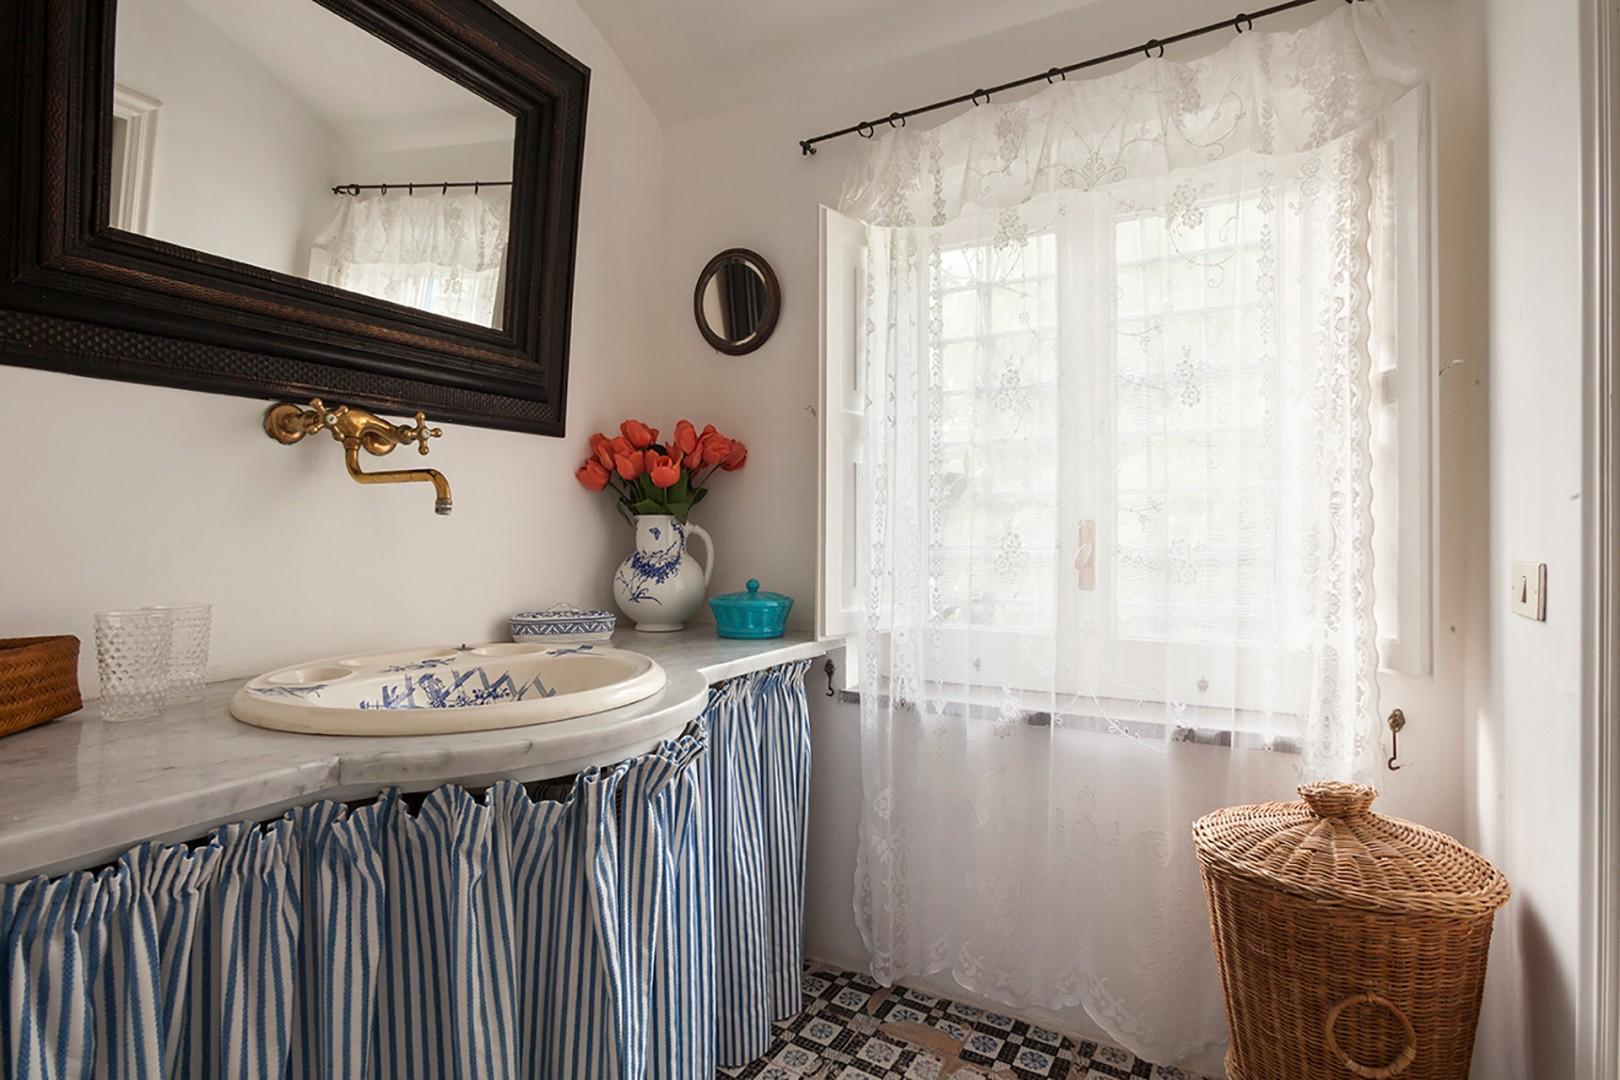 En suite bathroom to bedroom 5 has a large shower, sink, toilet and bidet.